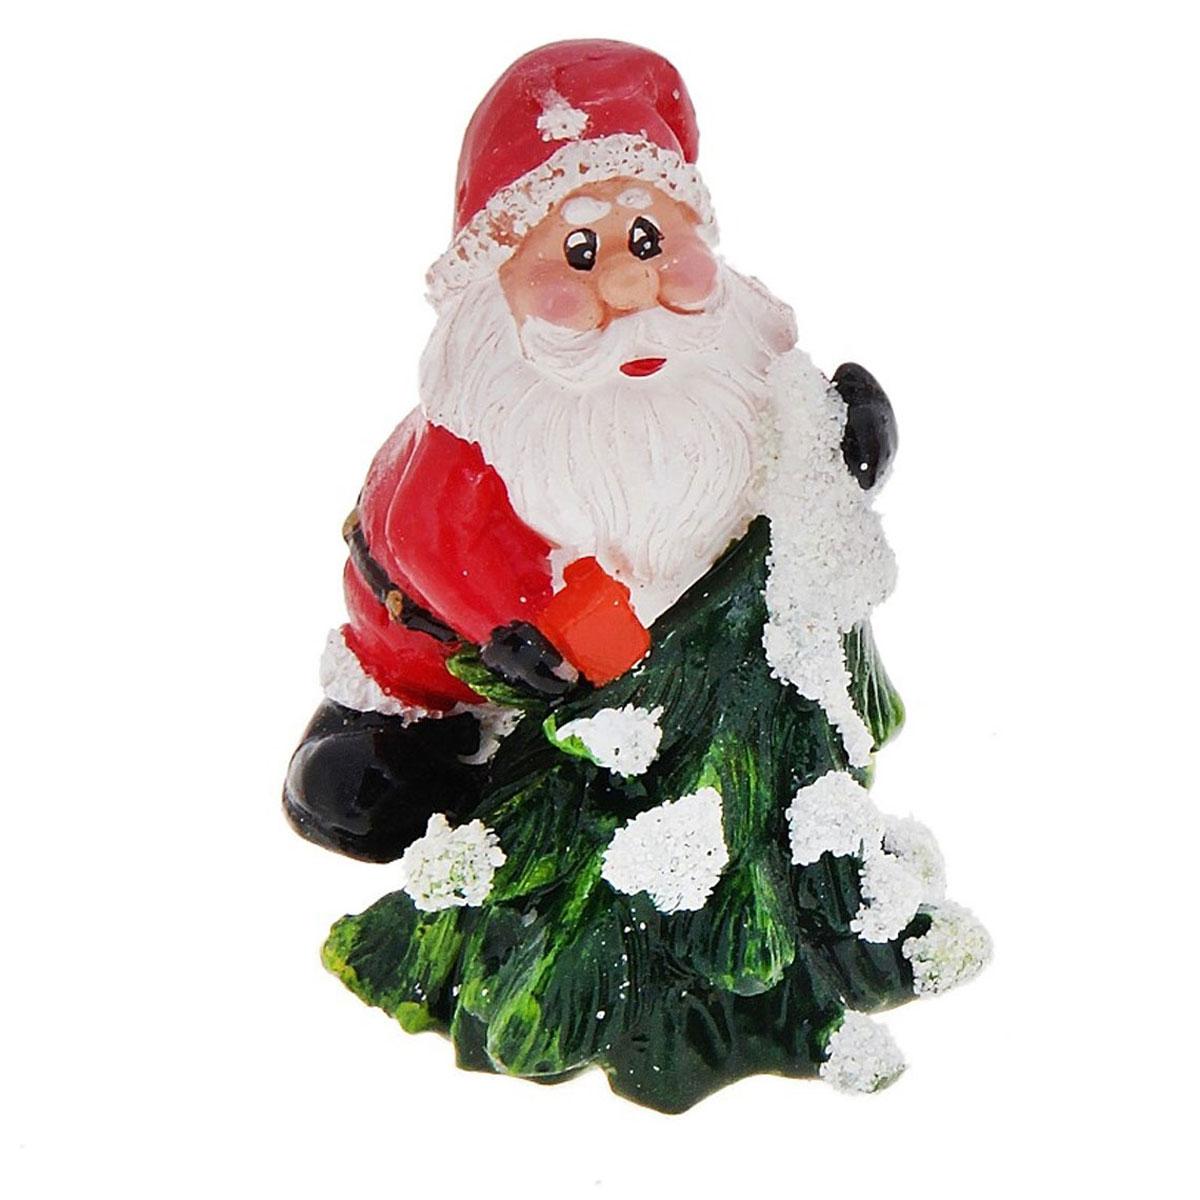 ВЛОГ Новогоднее party 2 елочка Дед Мороз и подарки Видео для 58